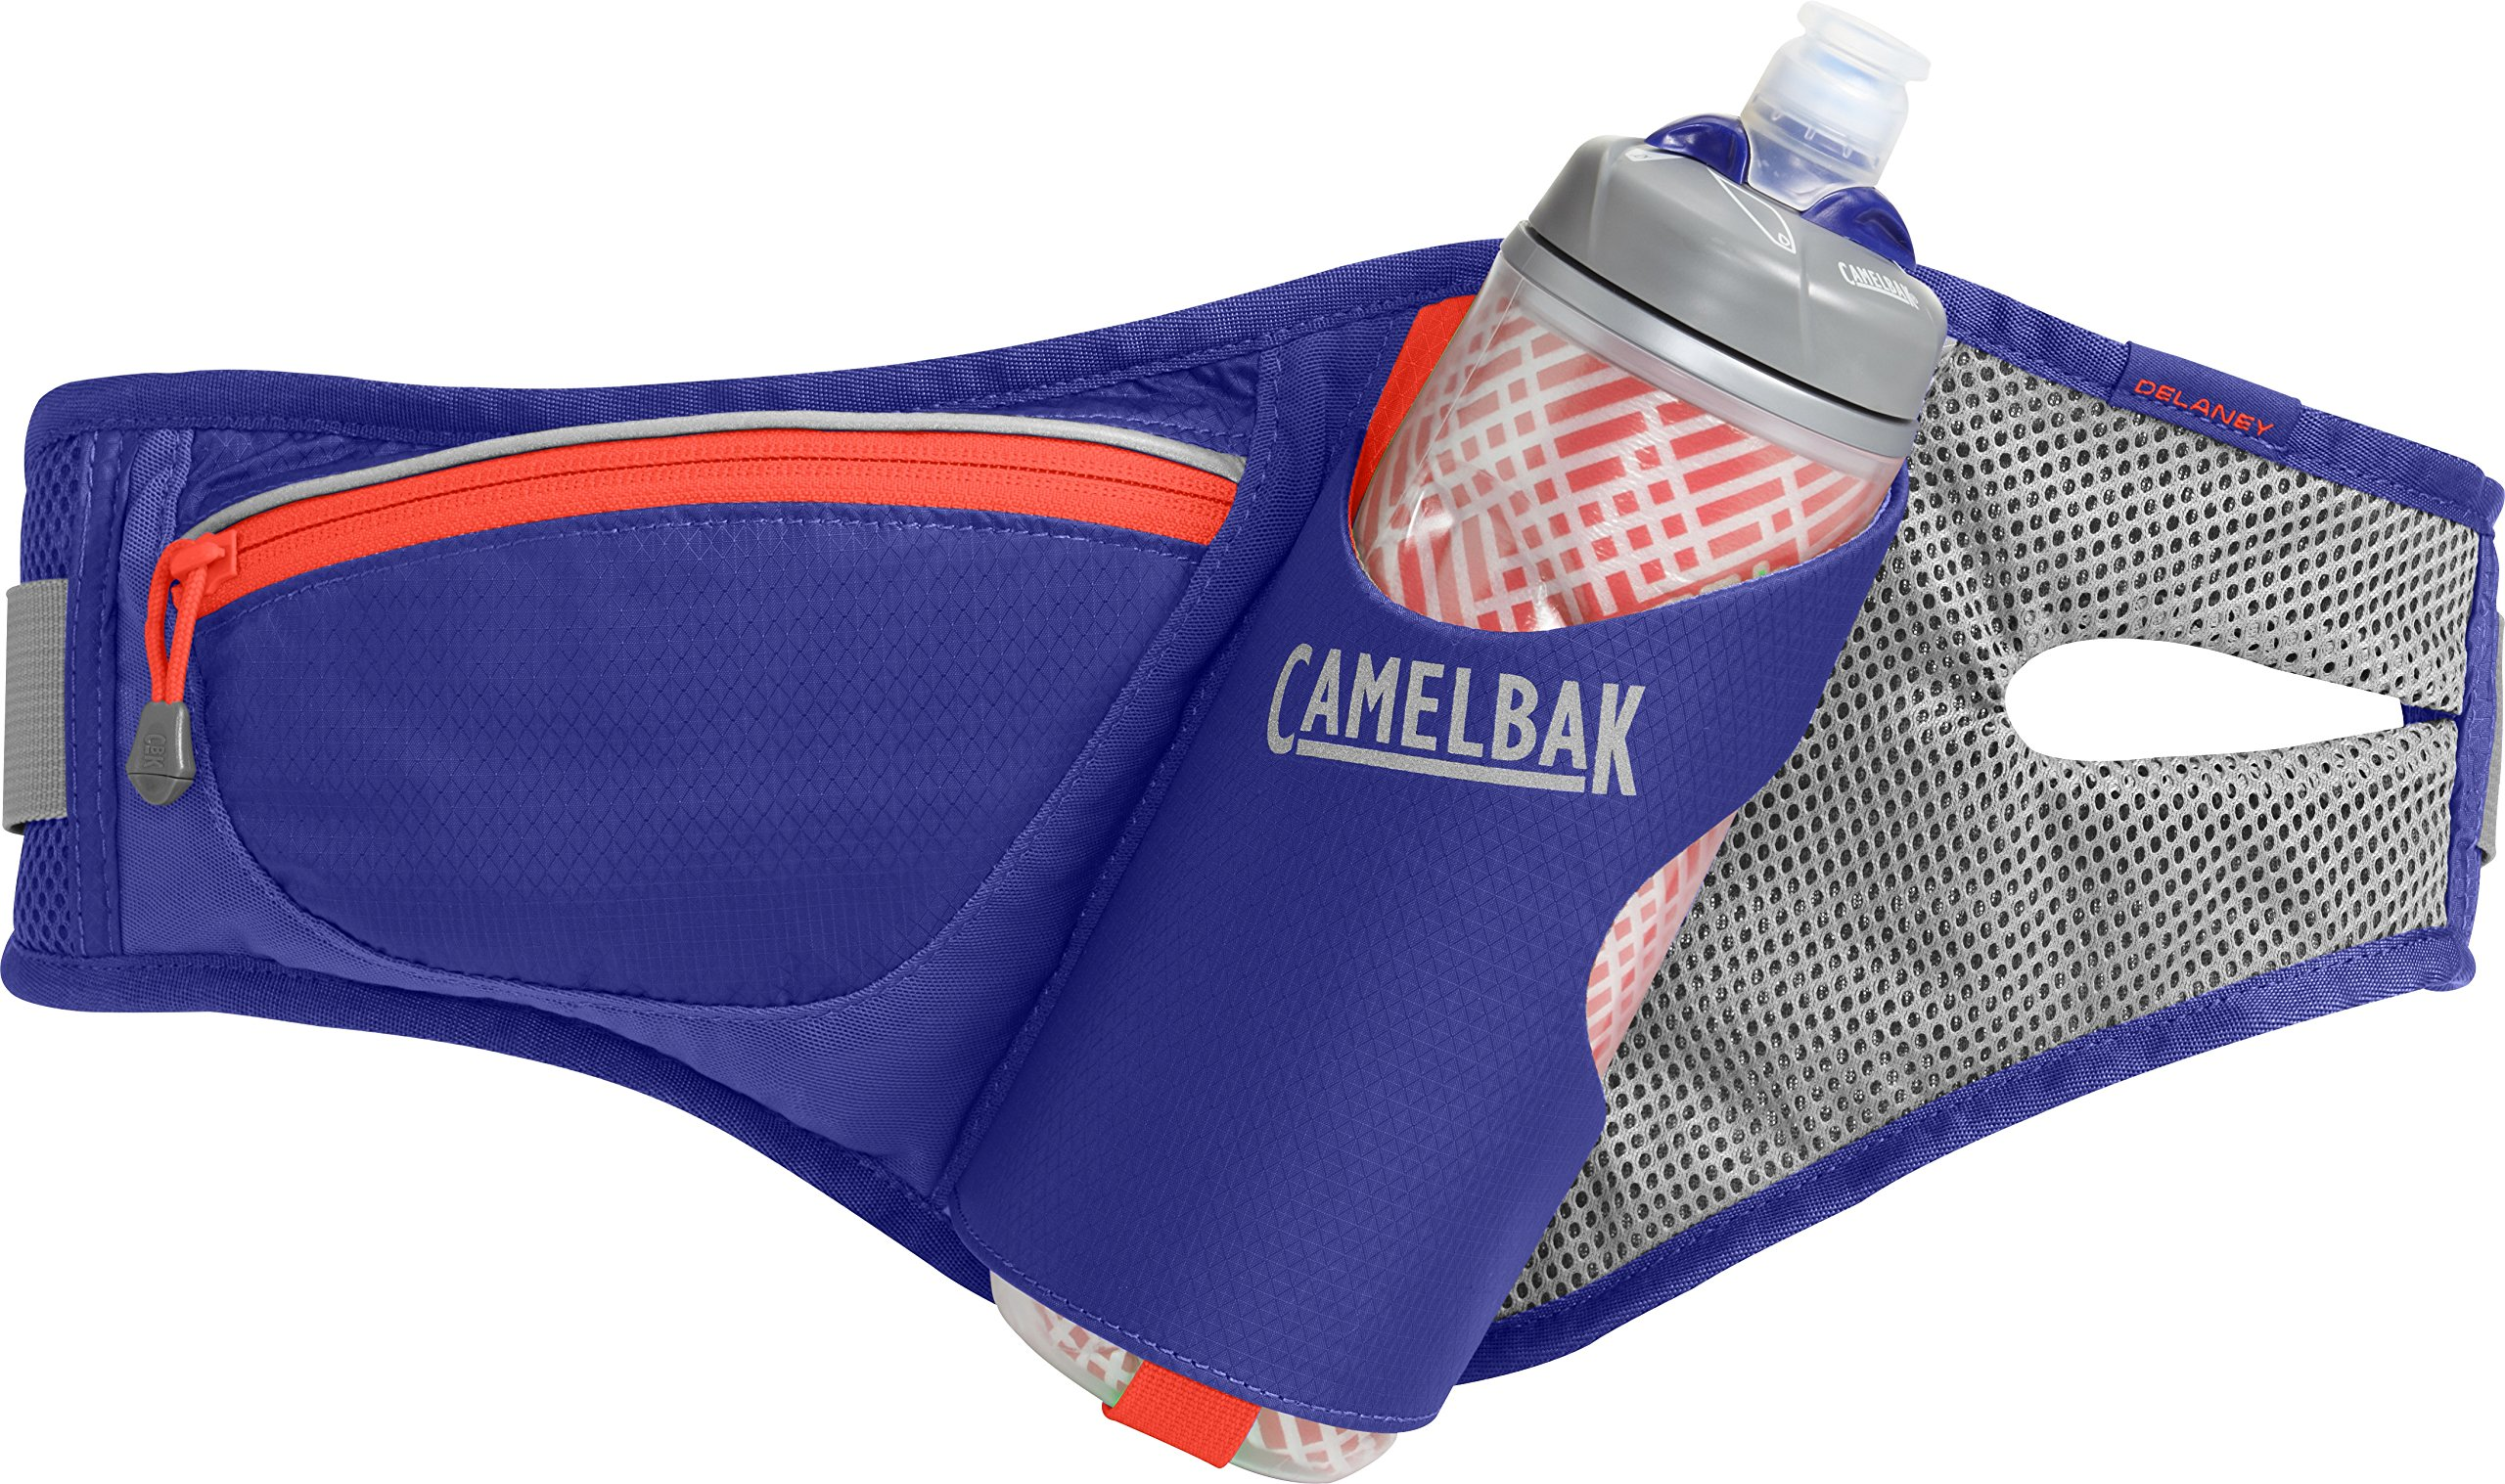 CamelBak Delaney Hydration Waist Amethyst